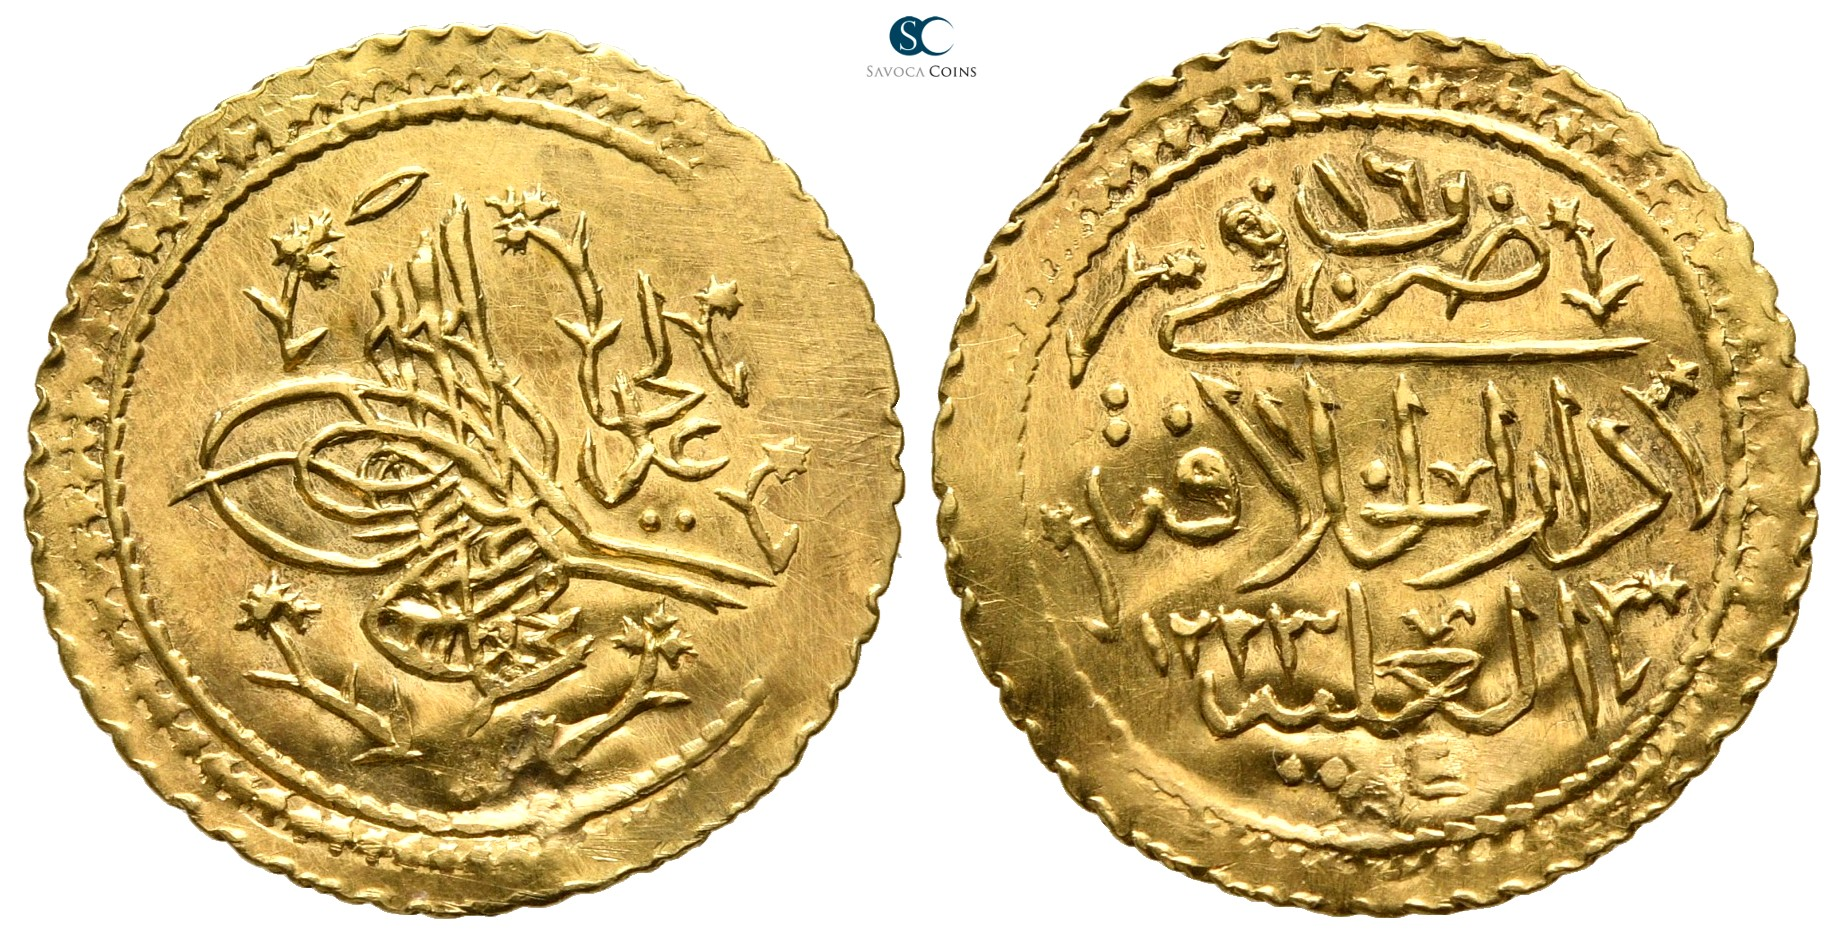 Qustantiniya (as Dar al-Khalifat al-a'liya [Constantinople]) mint. Mahmud II AD 1808-1839. Darülhilâfe Altın AV 738522